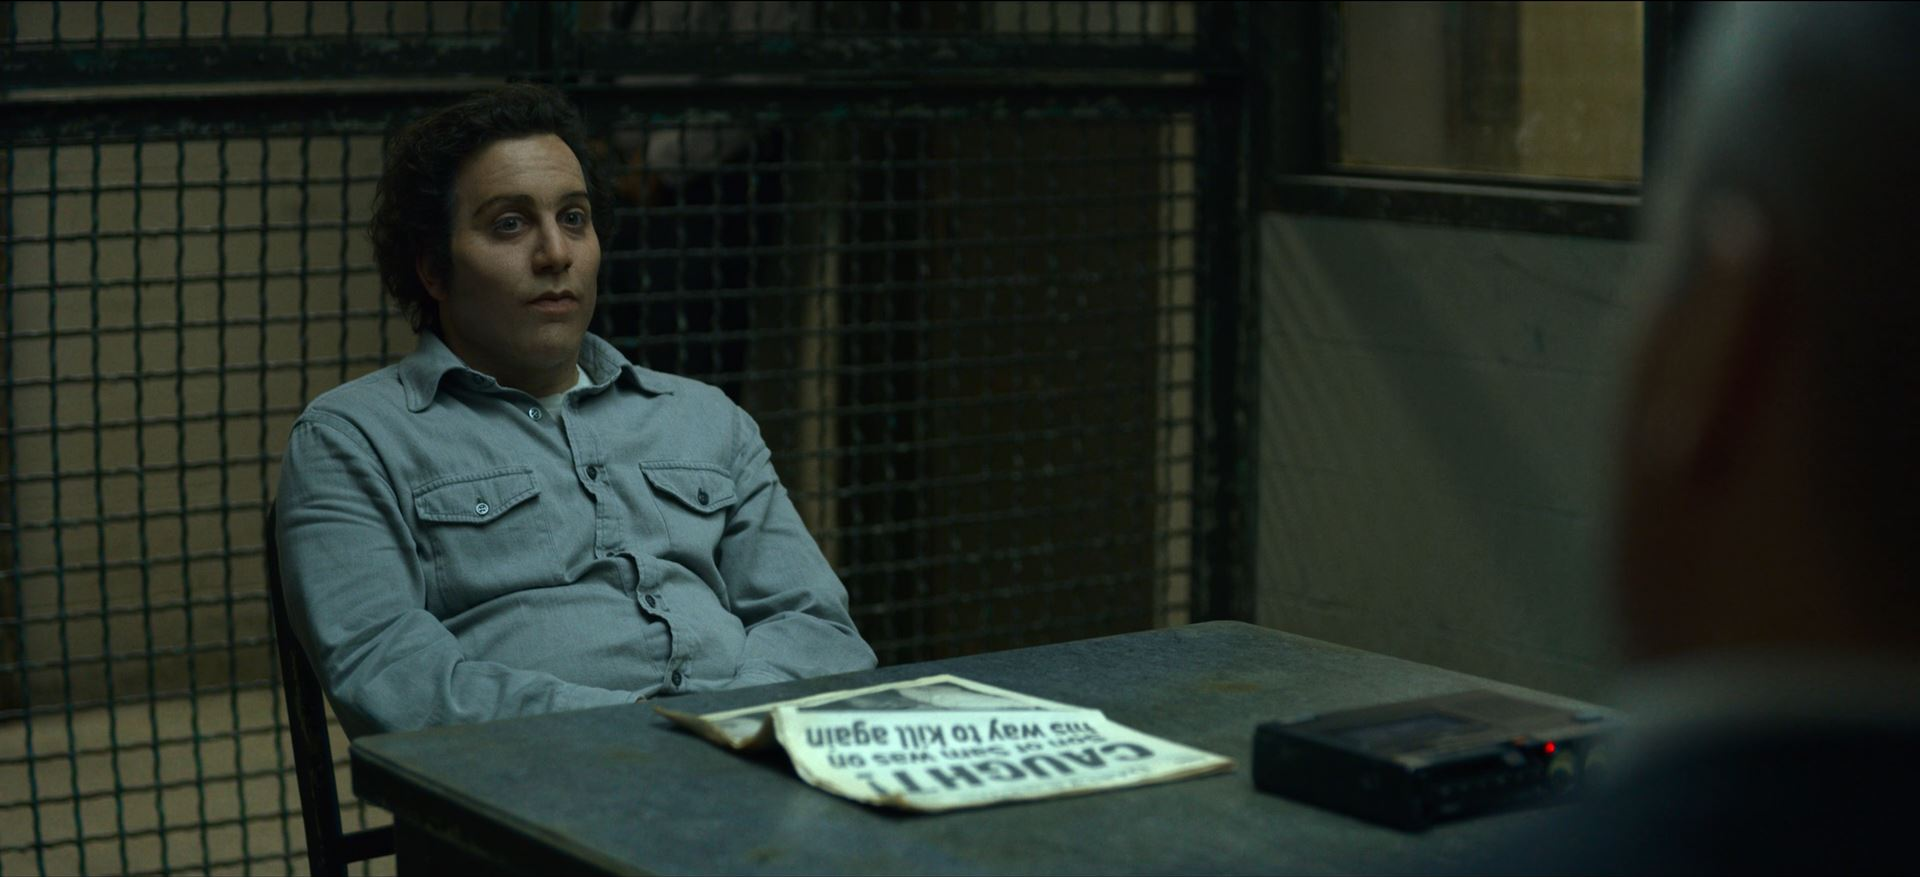 Mindhunter Season 2 Review - Son of Sam